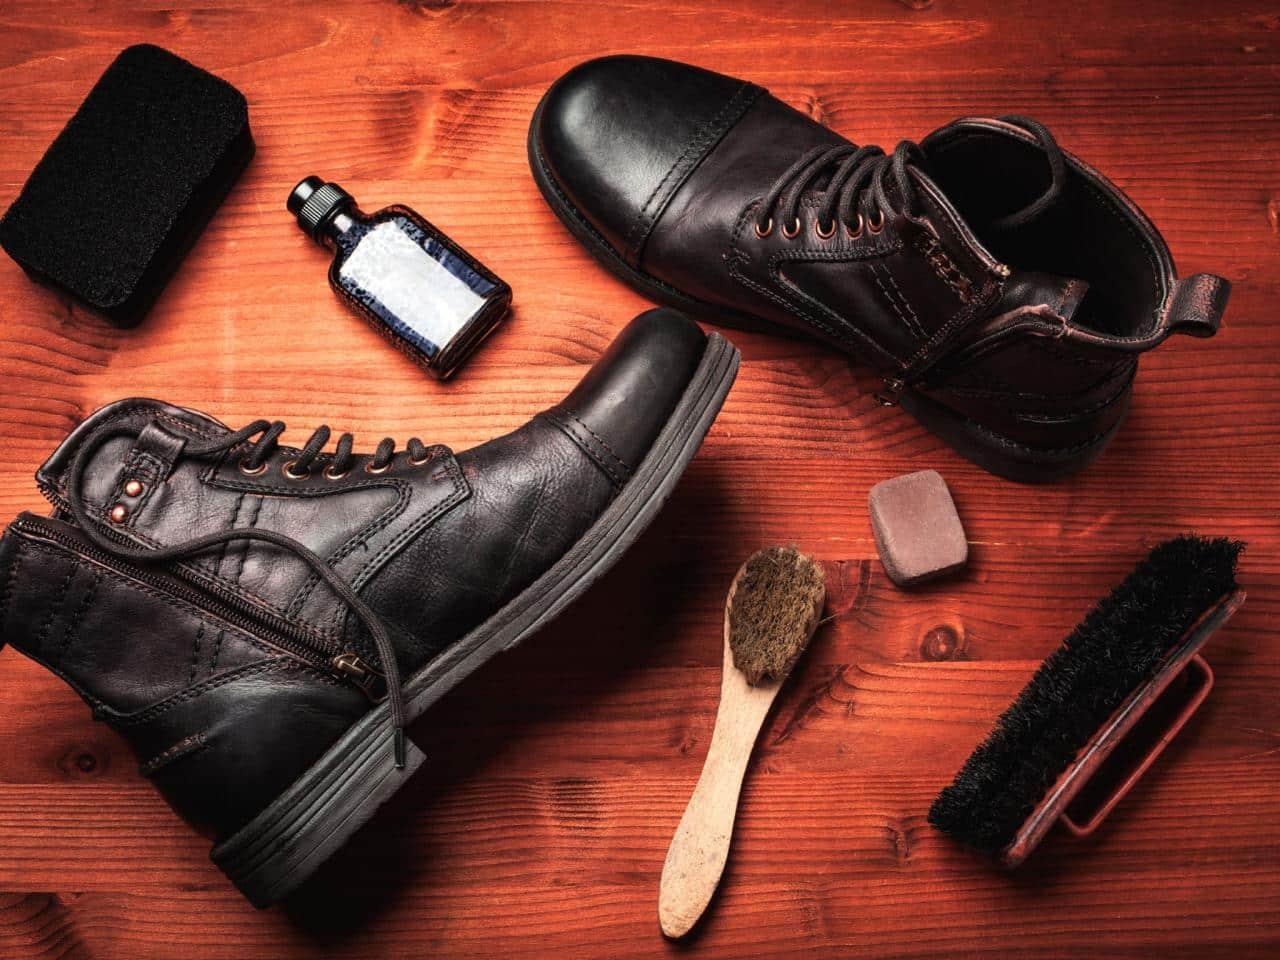 Pulire stivali pelle chiari